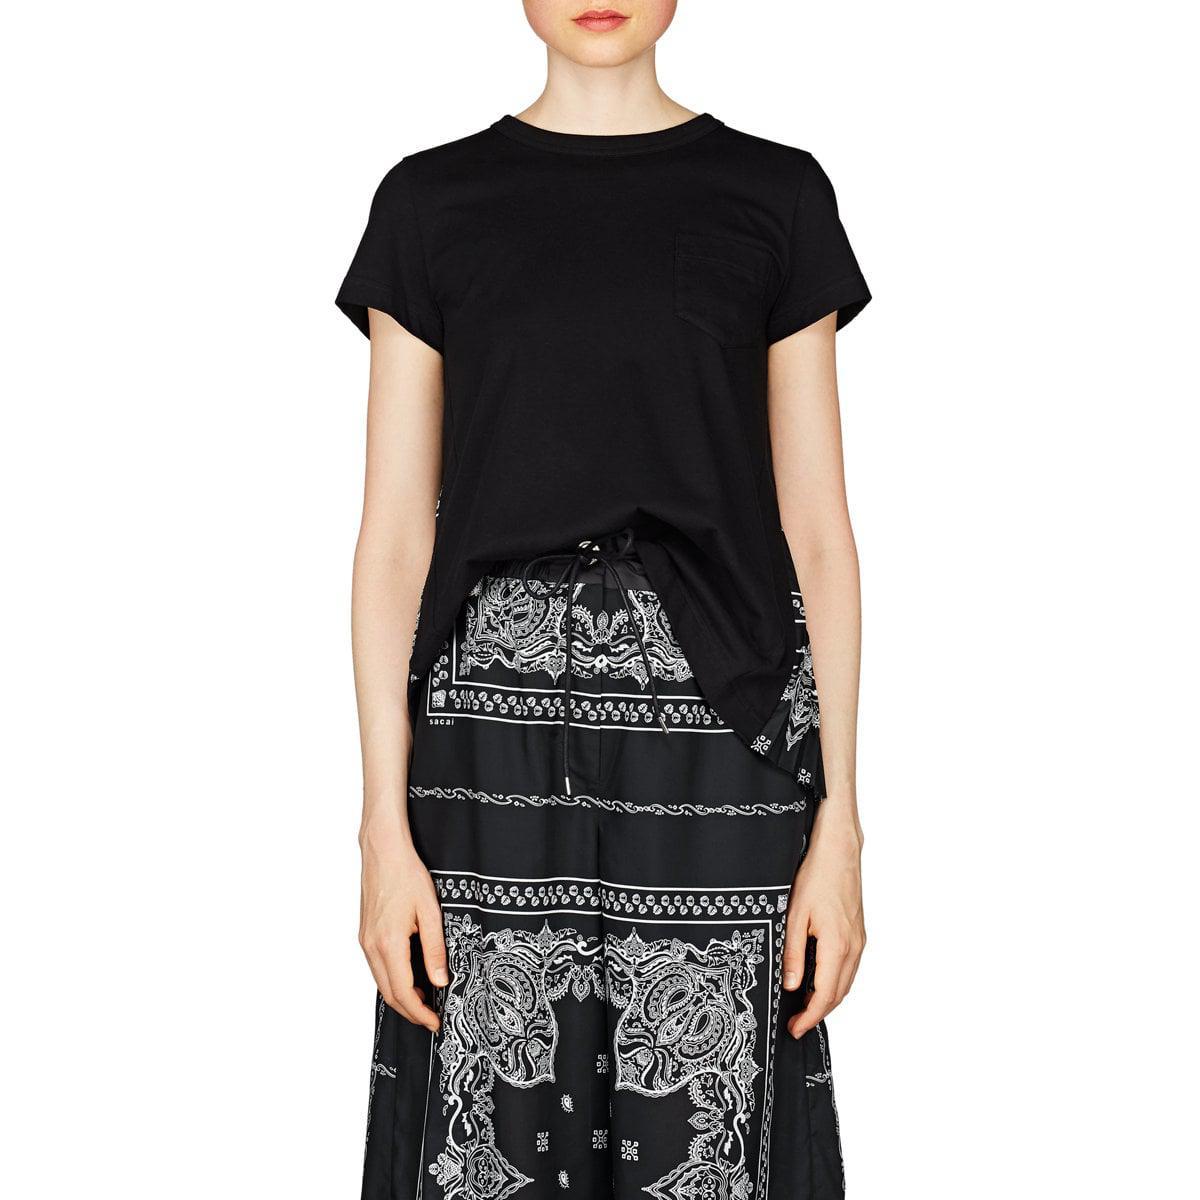 62eec5b2d3e Sacai - Black Bandana-print Cotton Swing T-shirt - Lyst. View fullscreen